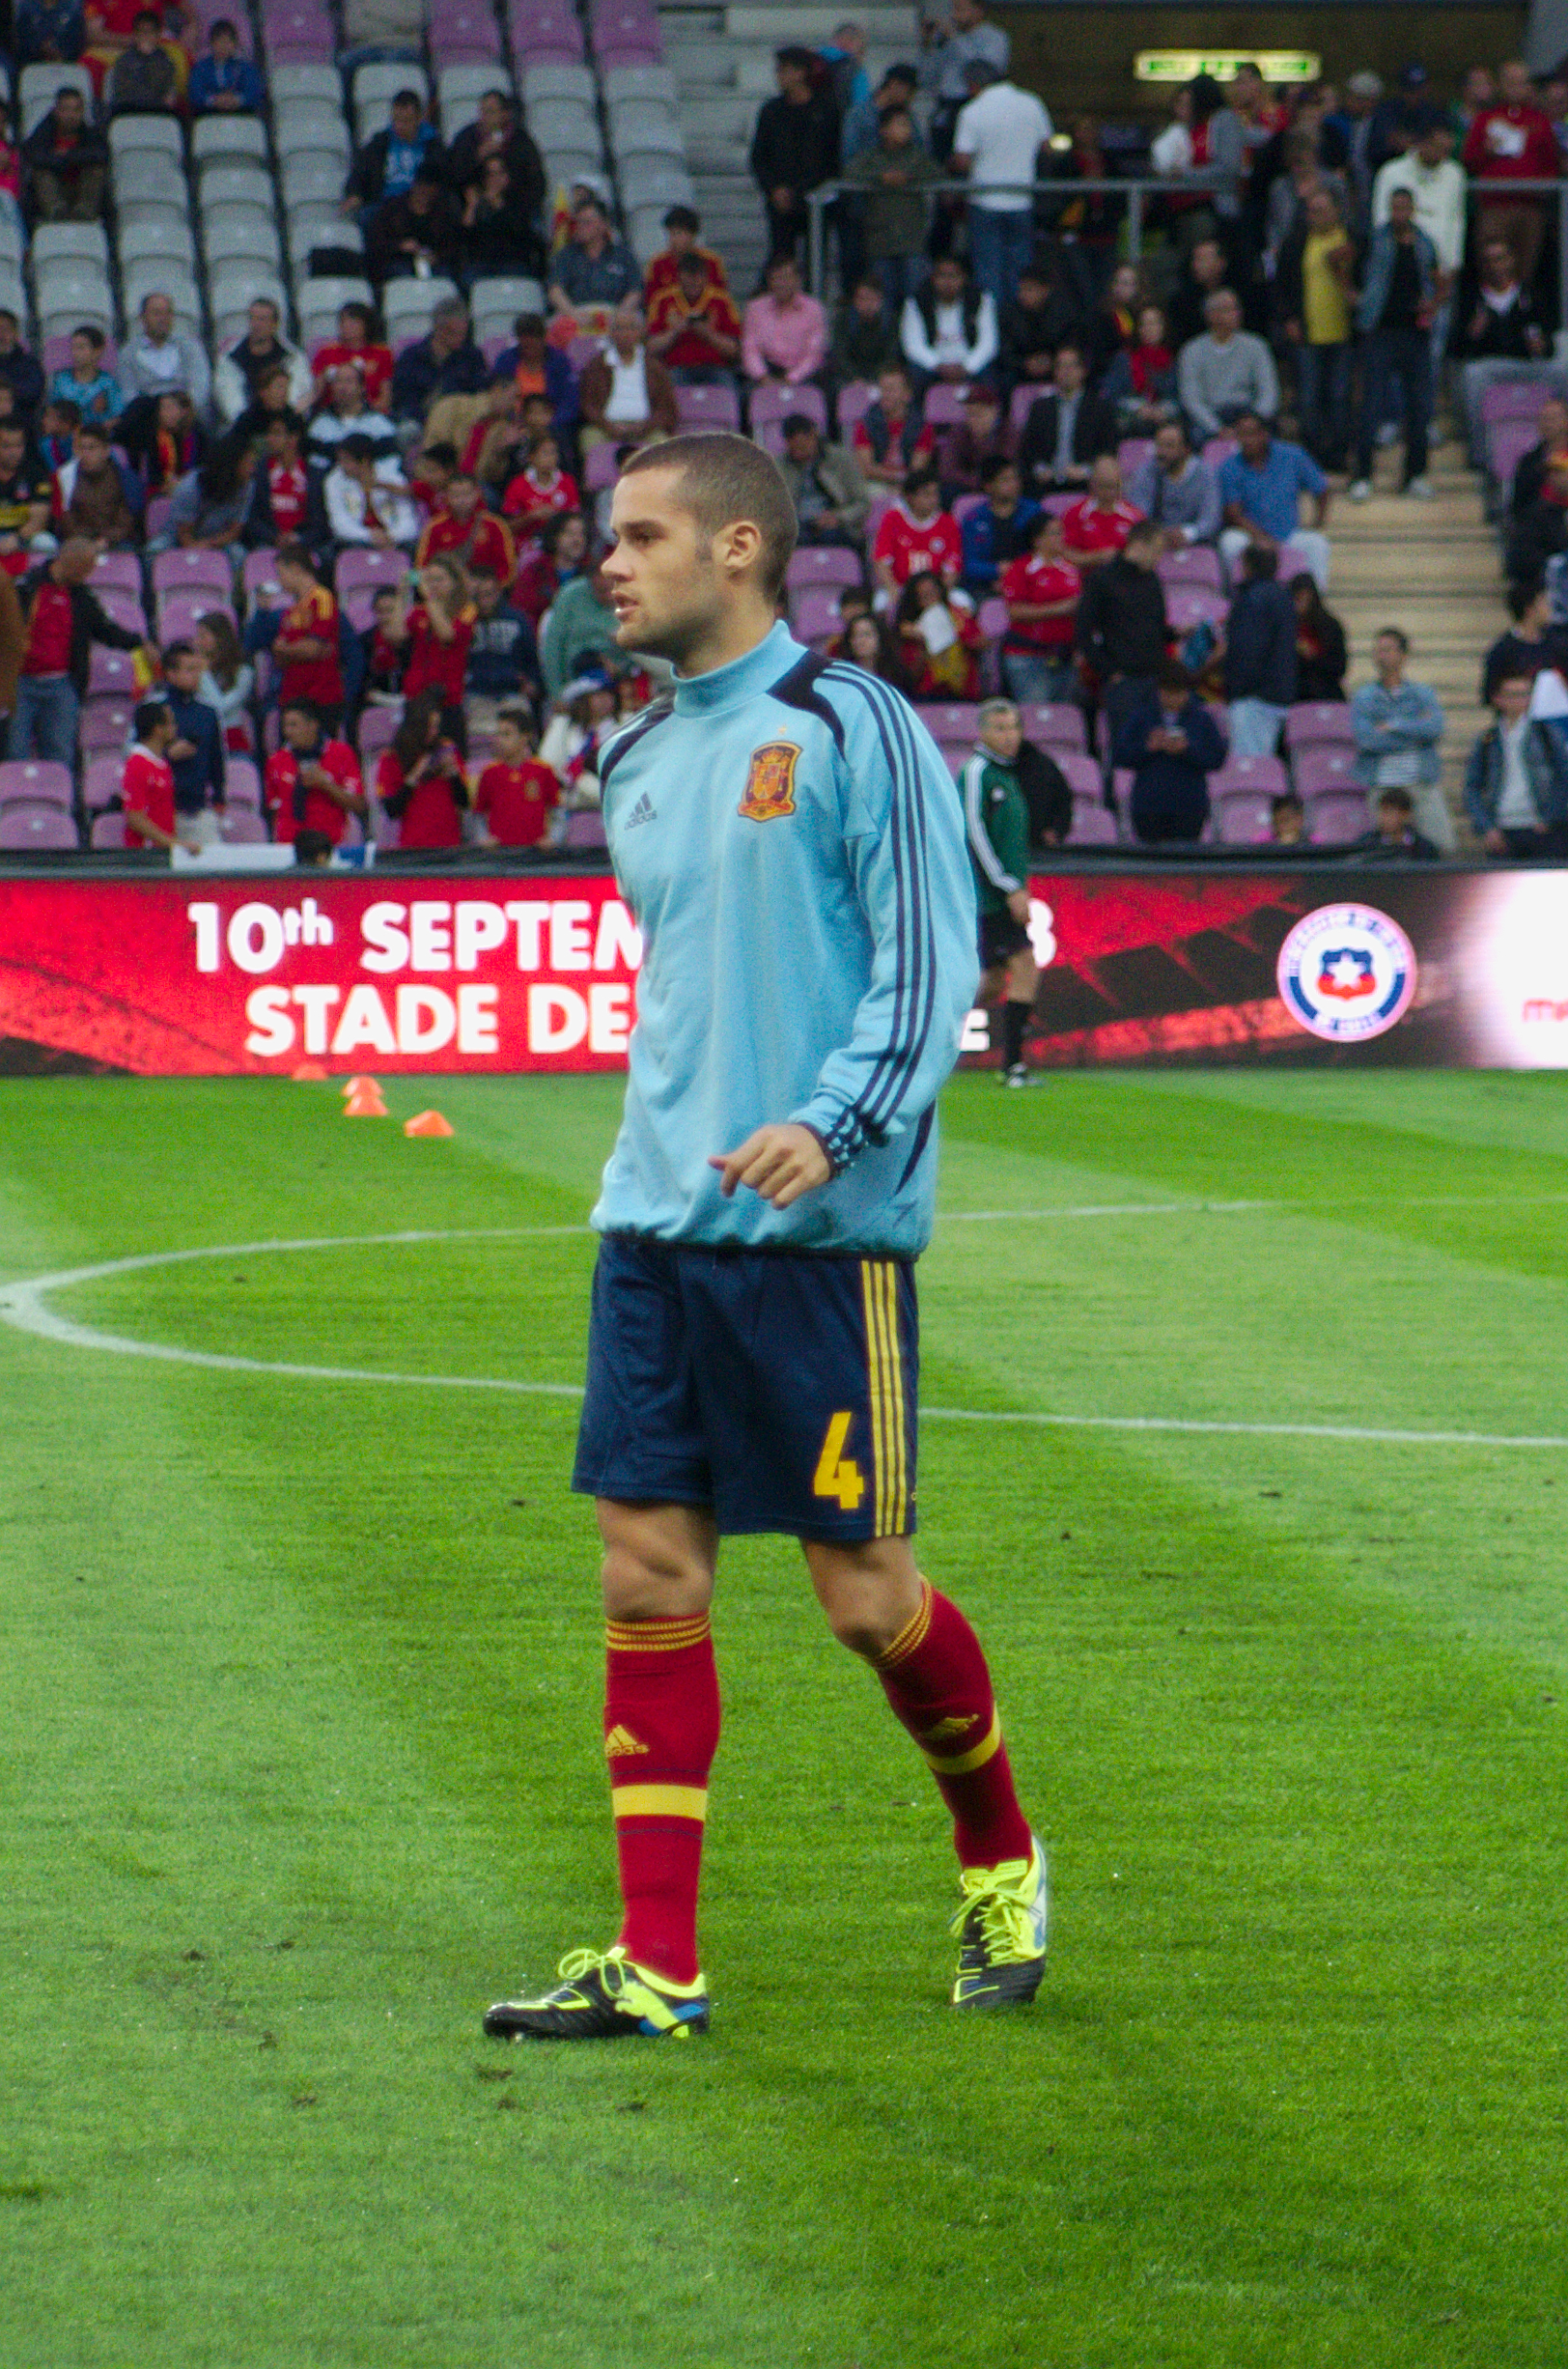 Image Result For Celta Valladolid